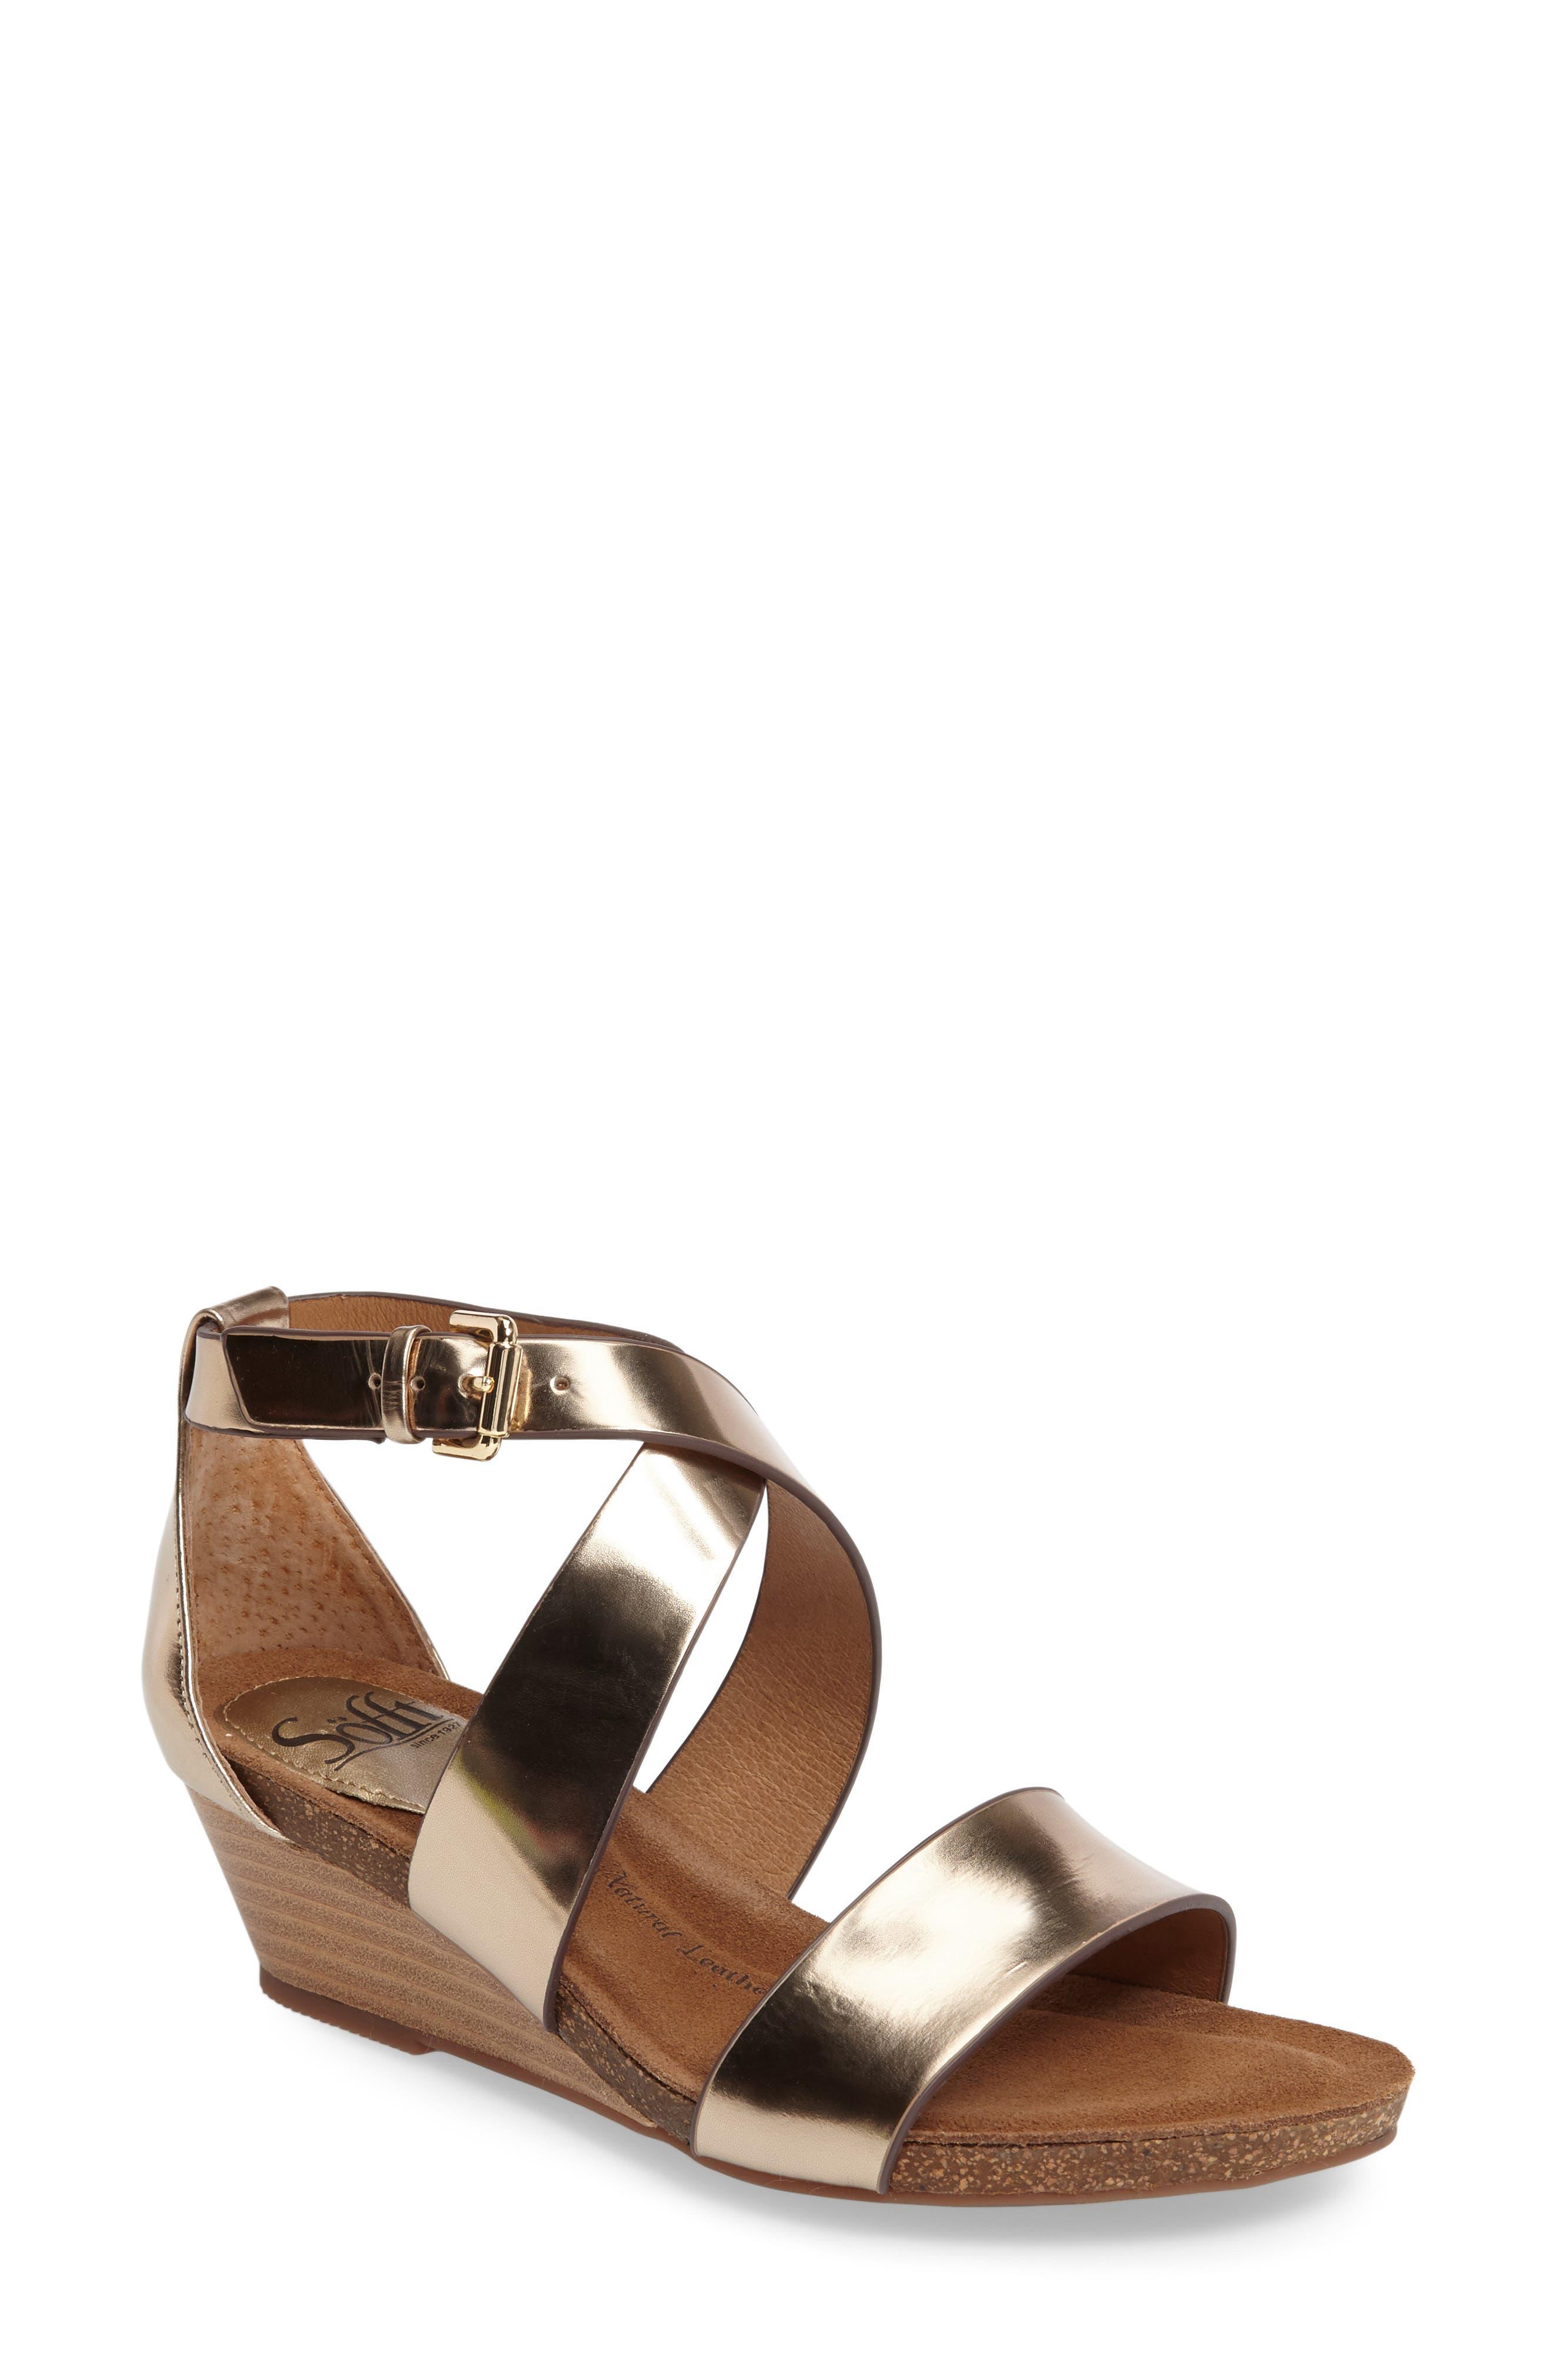 Vita Strappy Wedge Sandal,                             Main thumbnail 3, color,